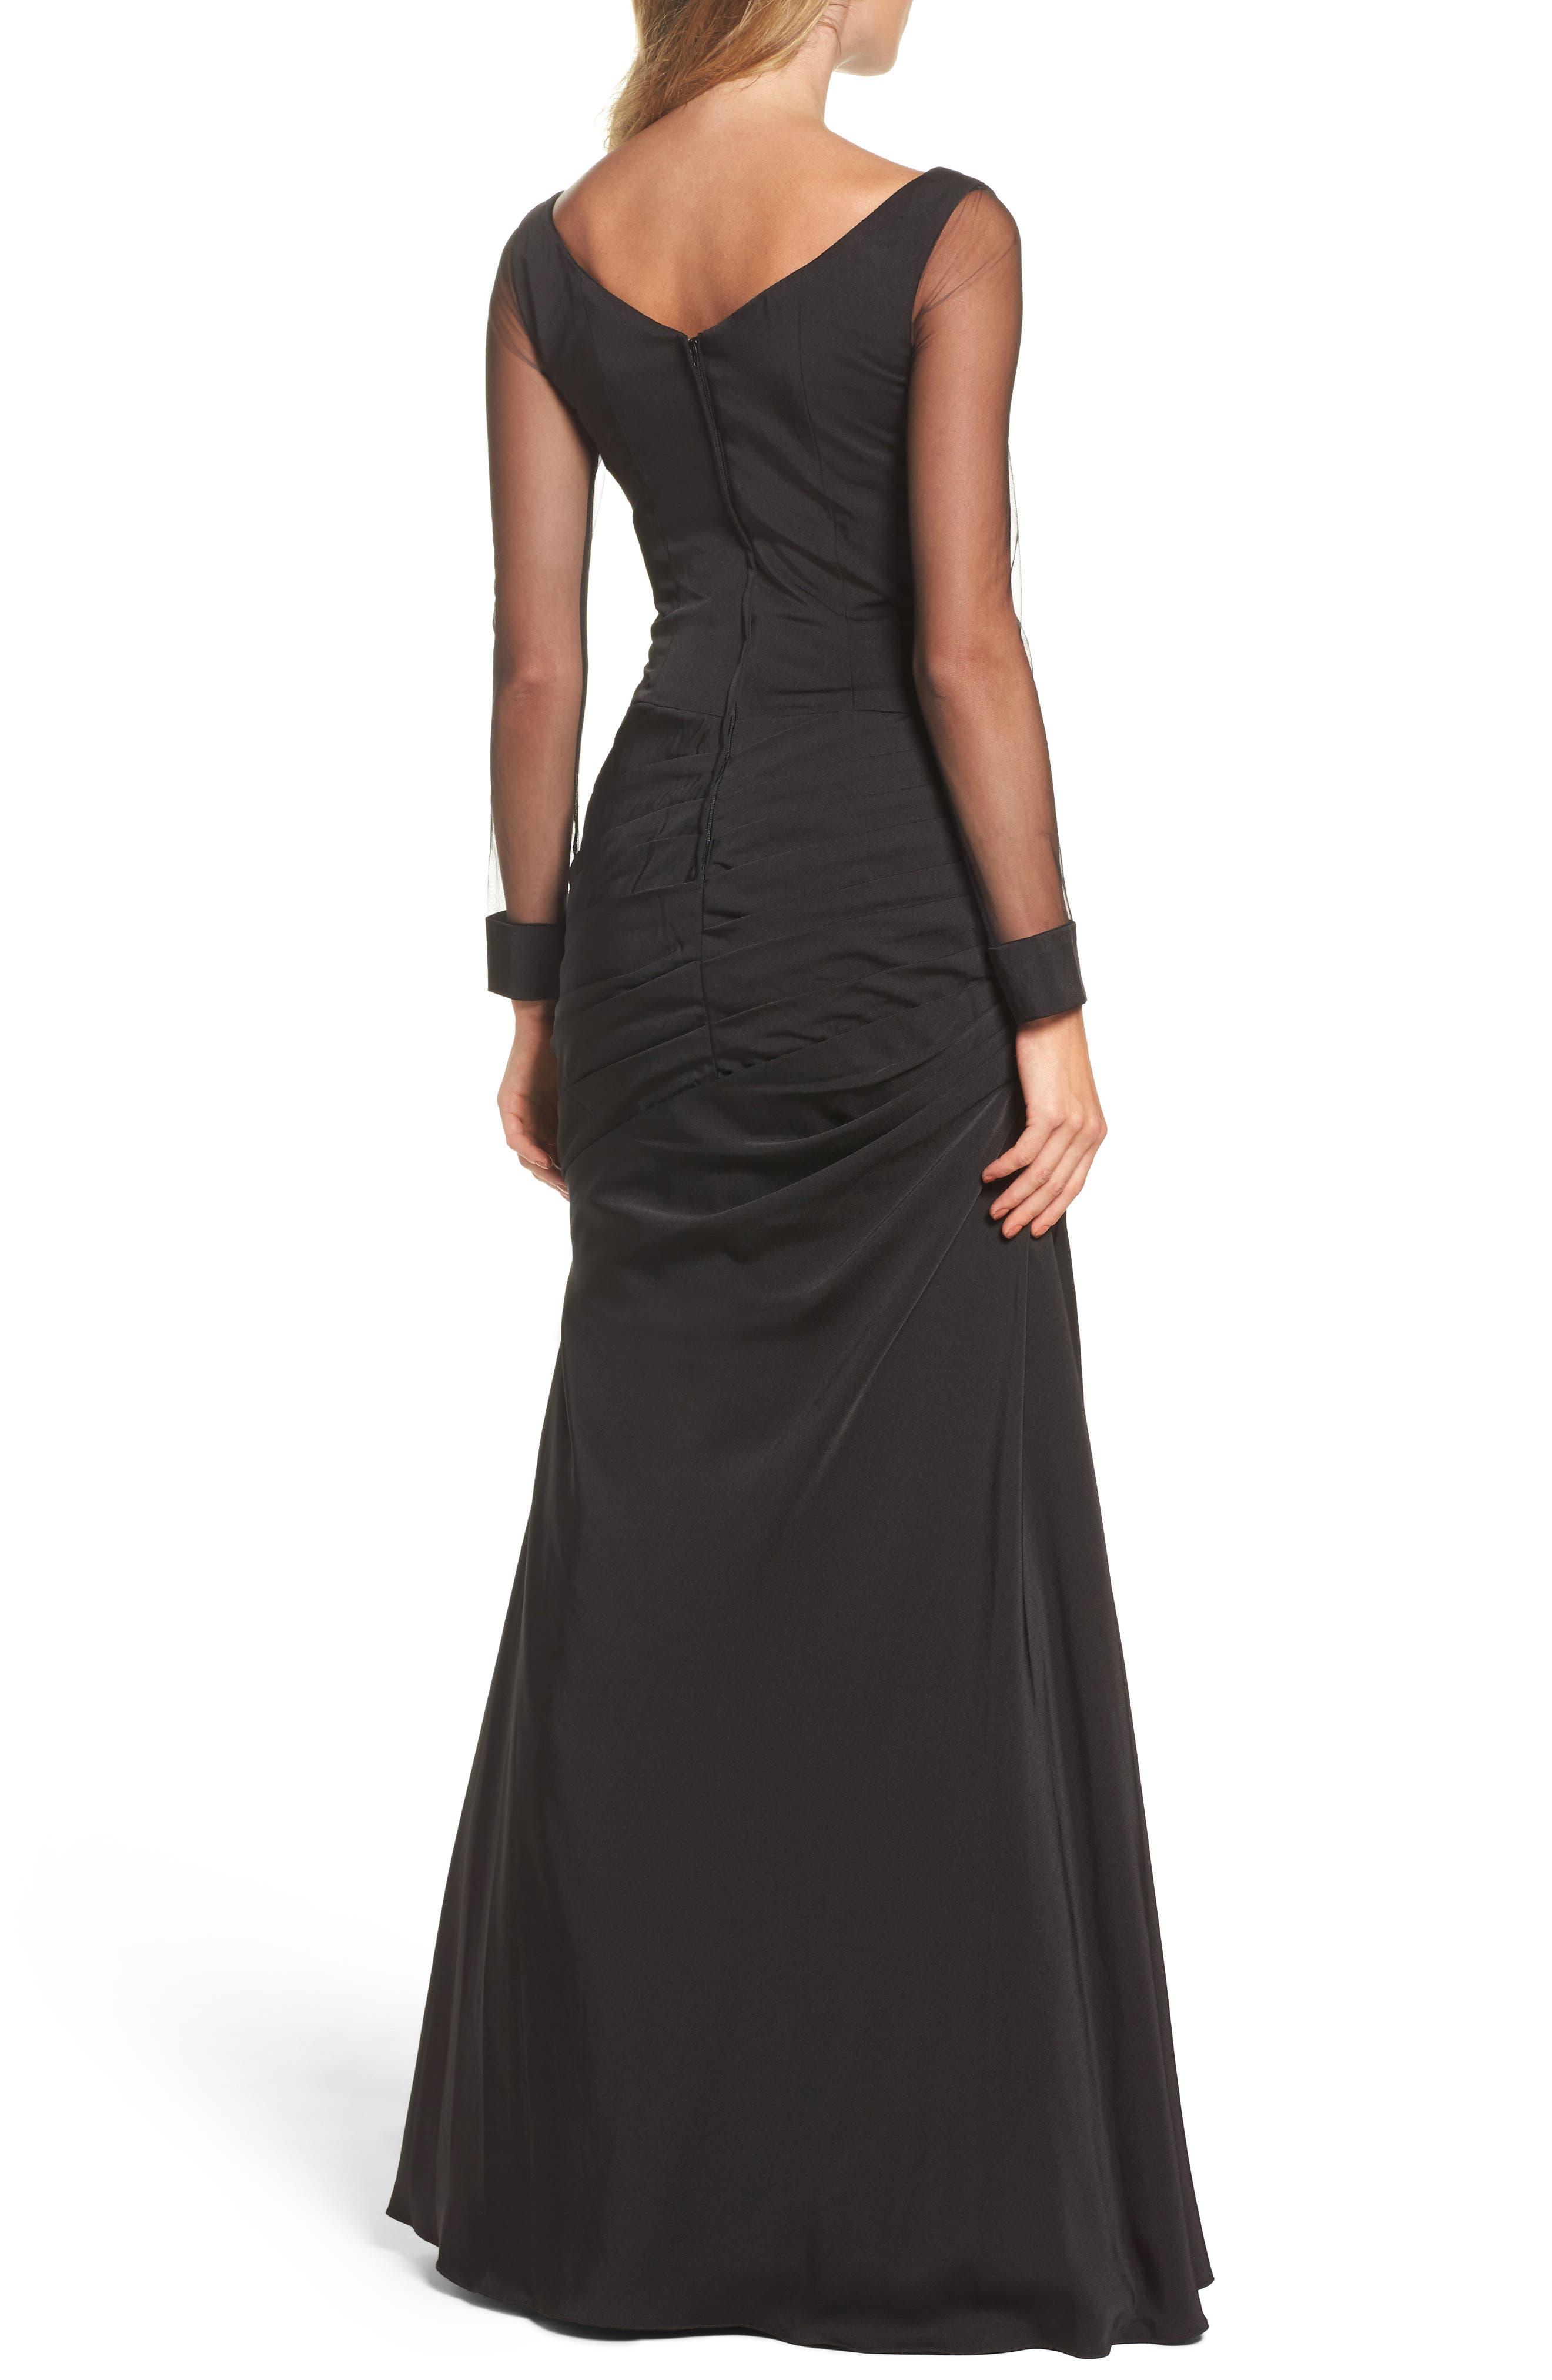 LA FEMME, Sheer Sleeve Gown, Alternate thumbnail 2, color, BLACK